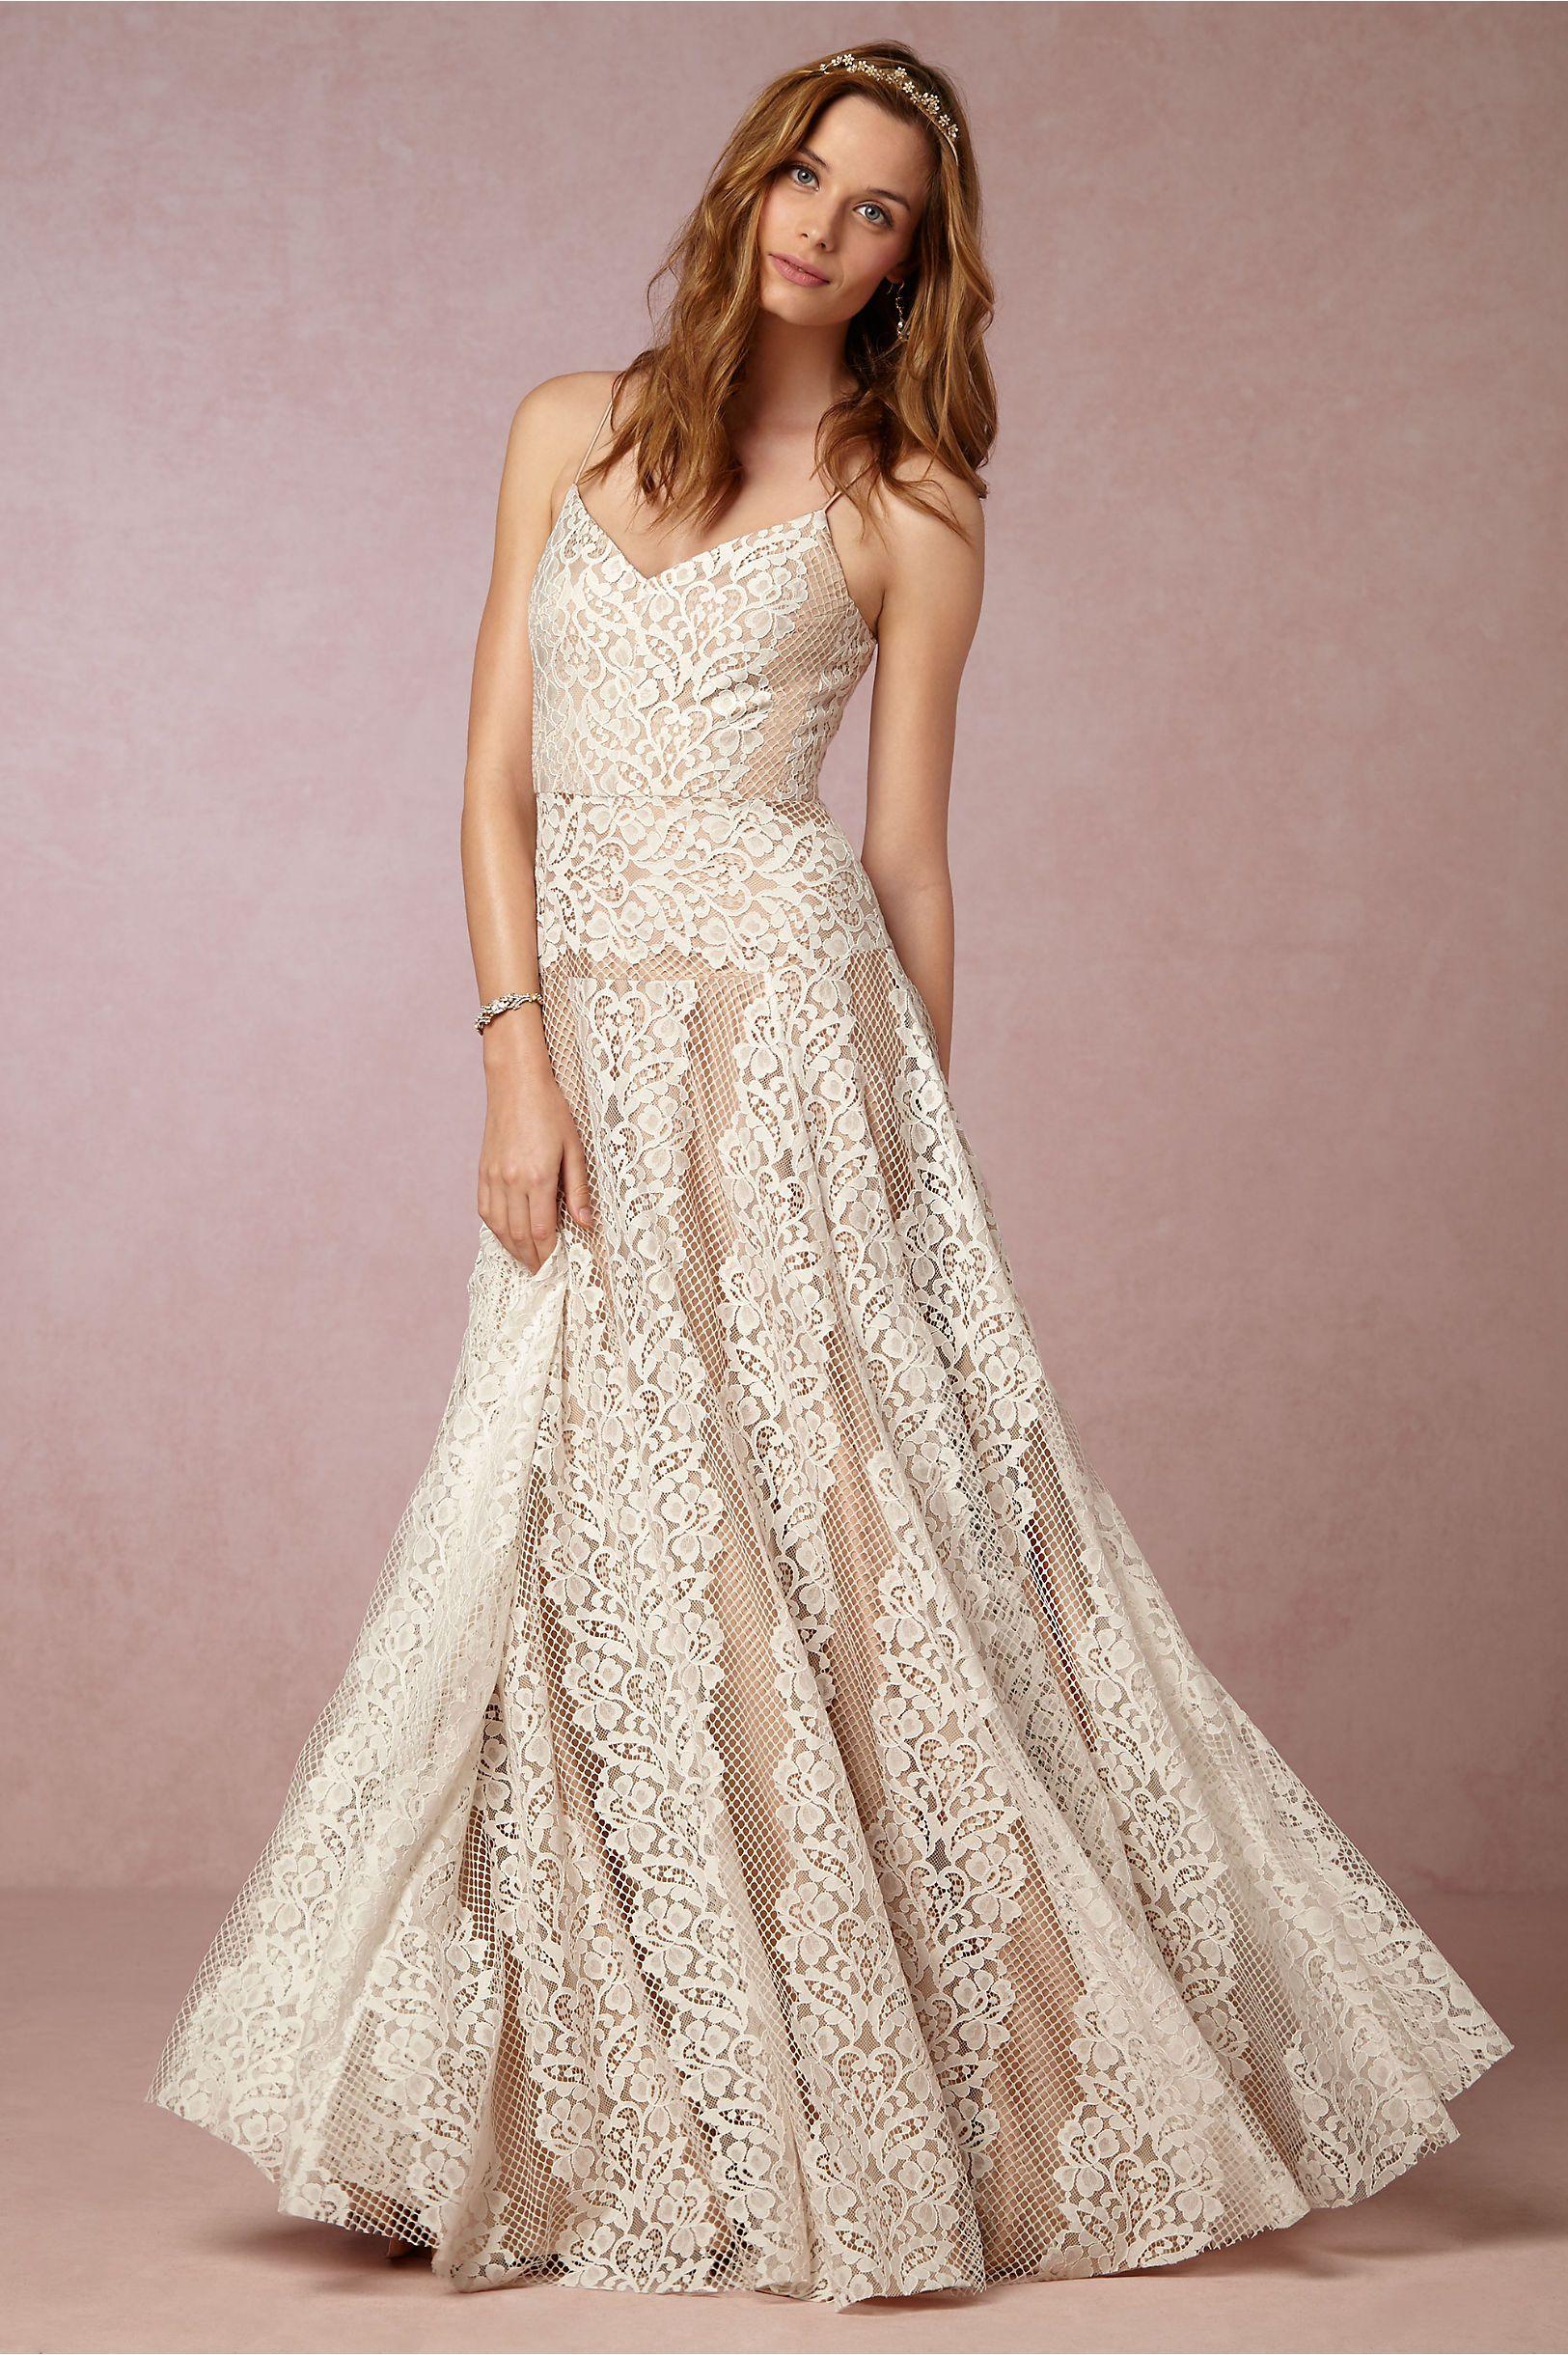 Bhldn larkin gown in bride wedding dresses lace at bhldn for Bhldn wedding dress sale